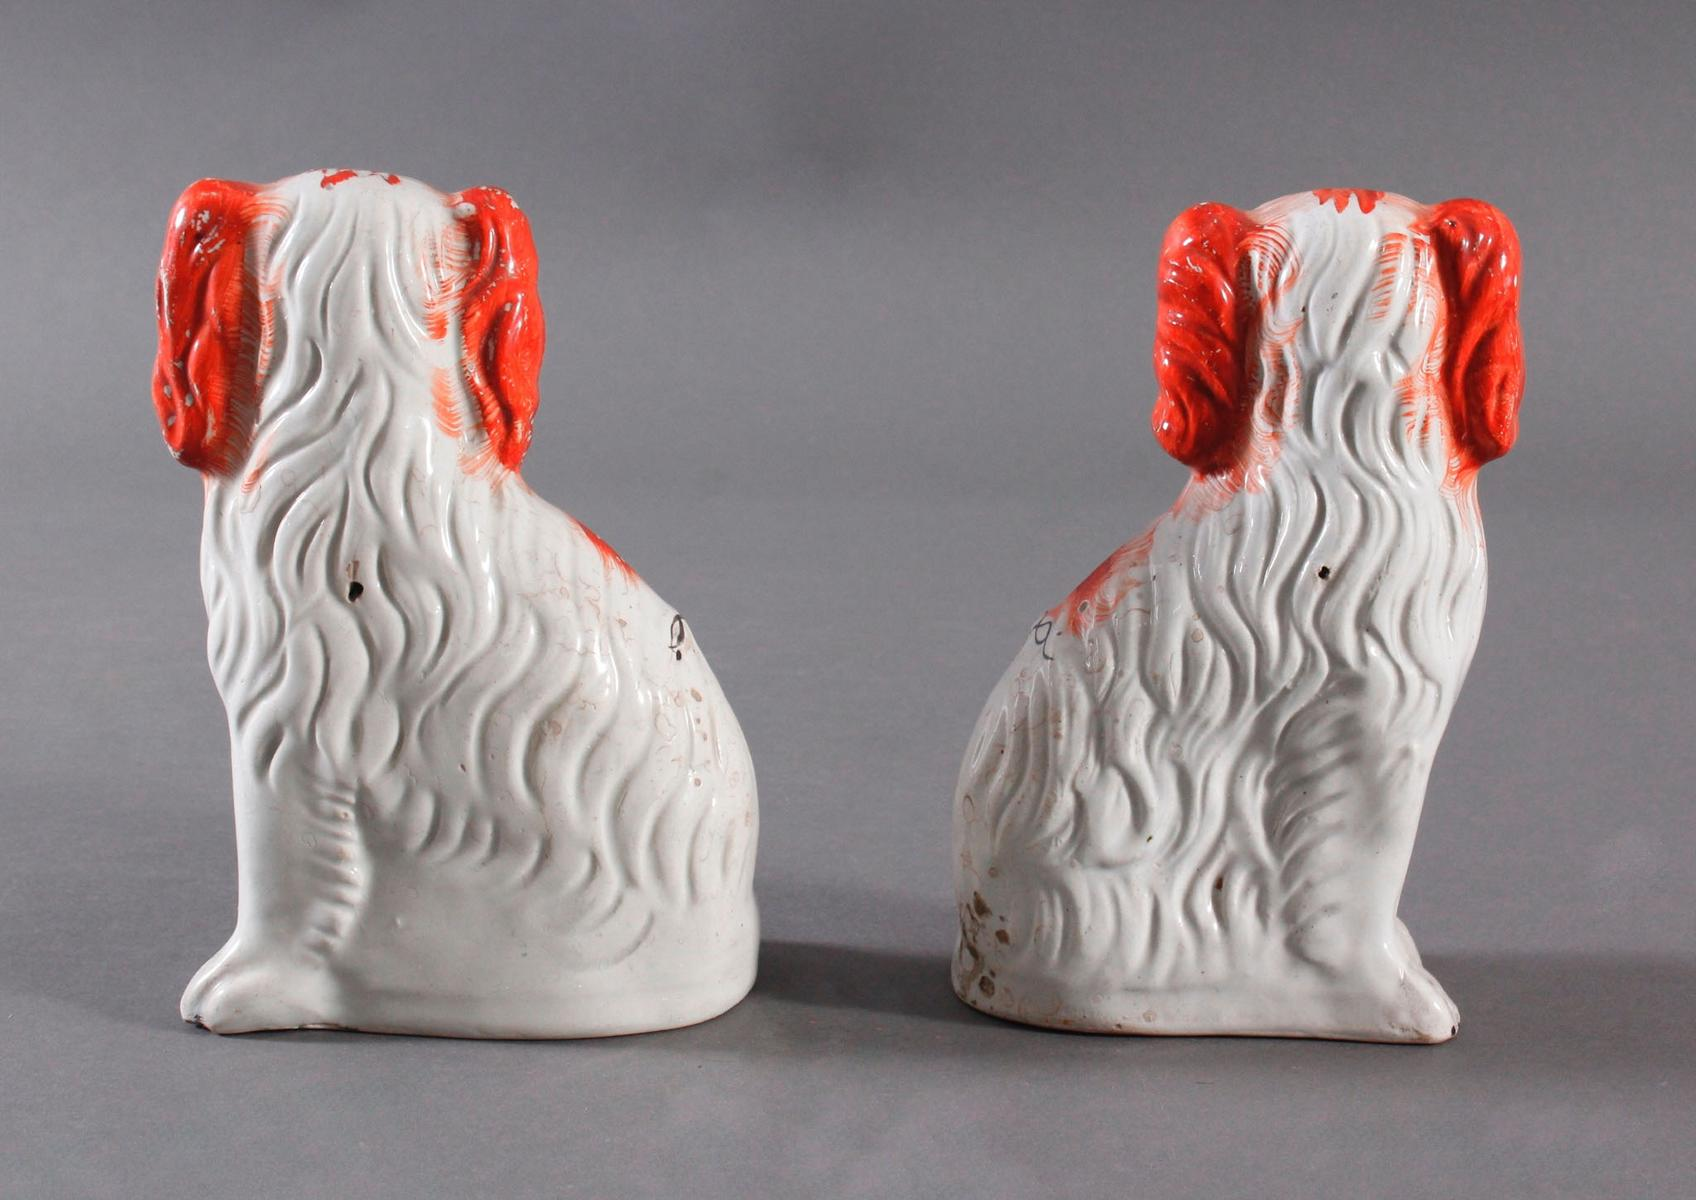 Kamin Hunde-Paar, Staffordshire Spaniels, England 19. Jahrhundert-5